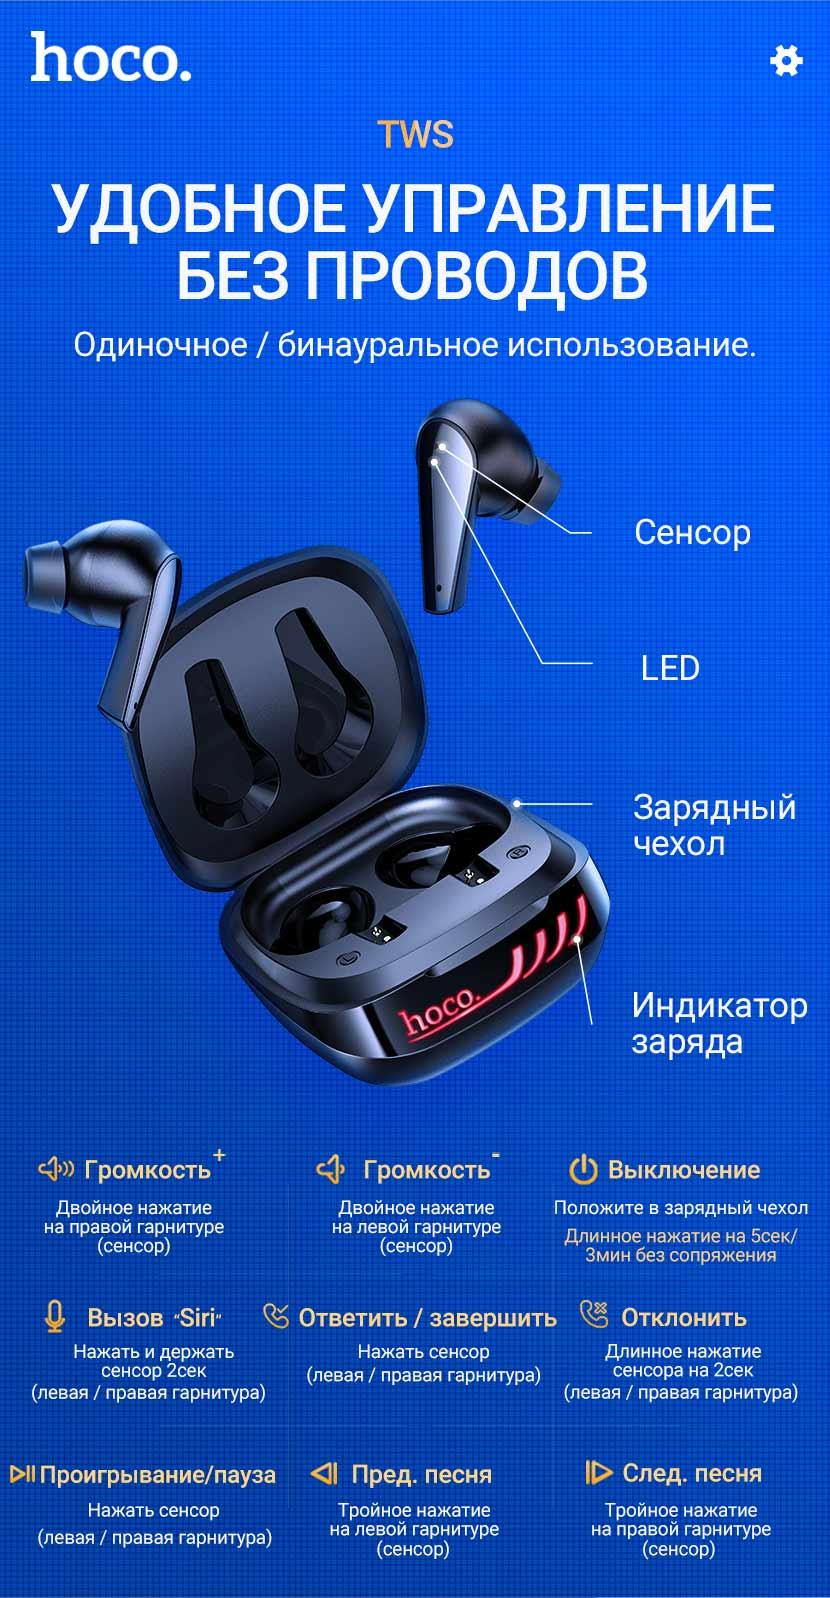 hoco news es43 lucky sound tws wireless headset operation ru